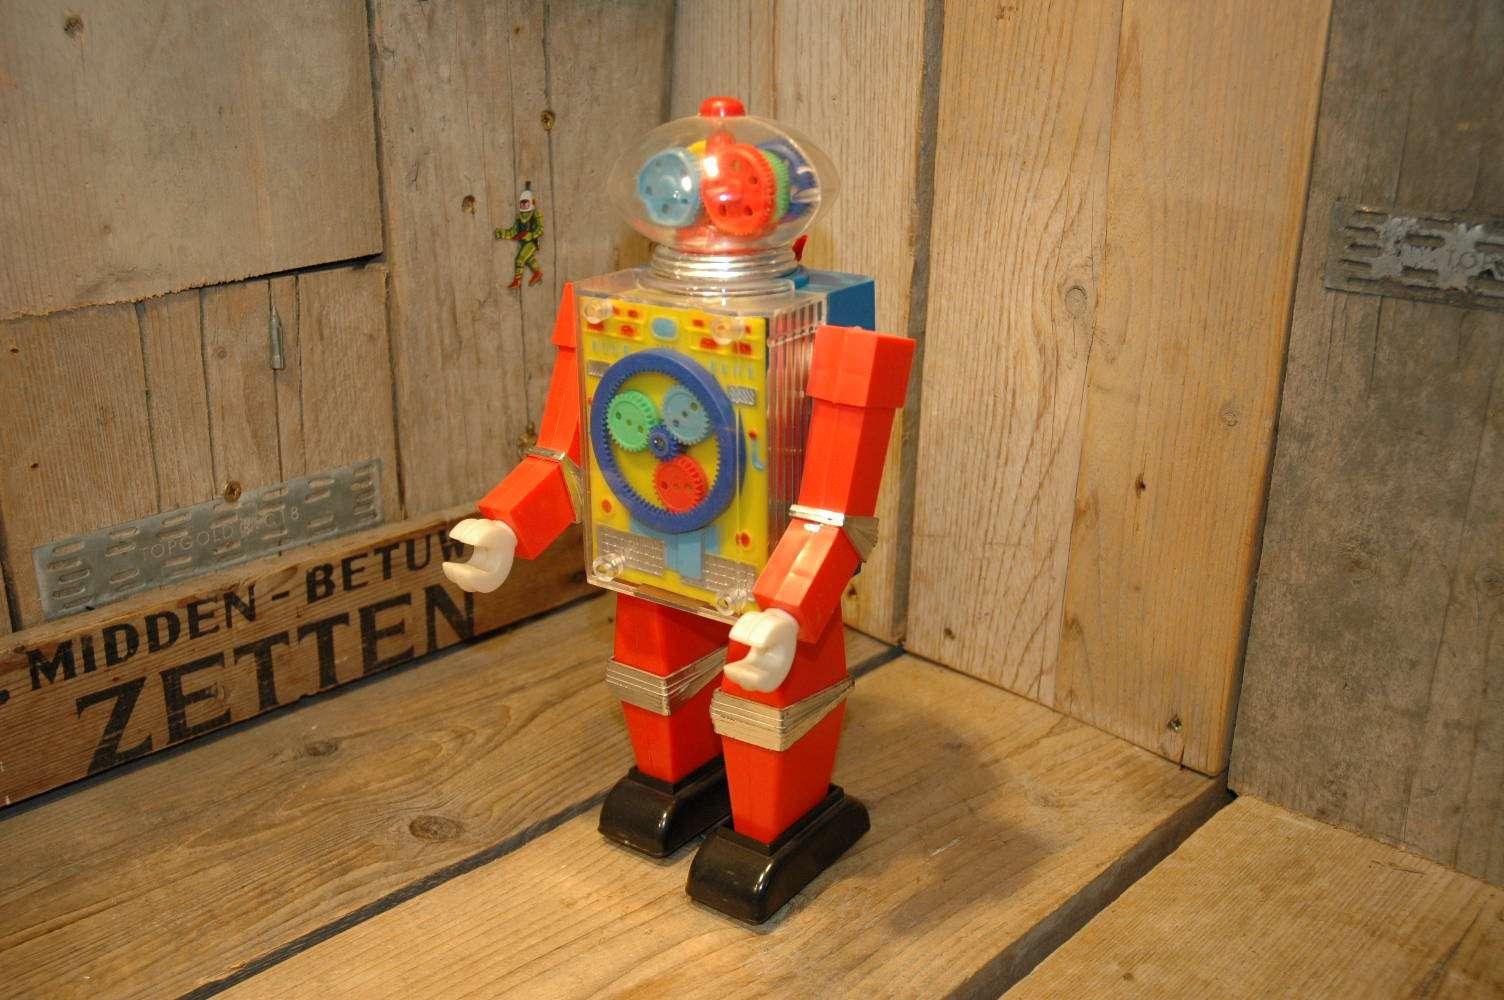 Hong Kong - See Thru Robot